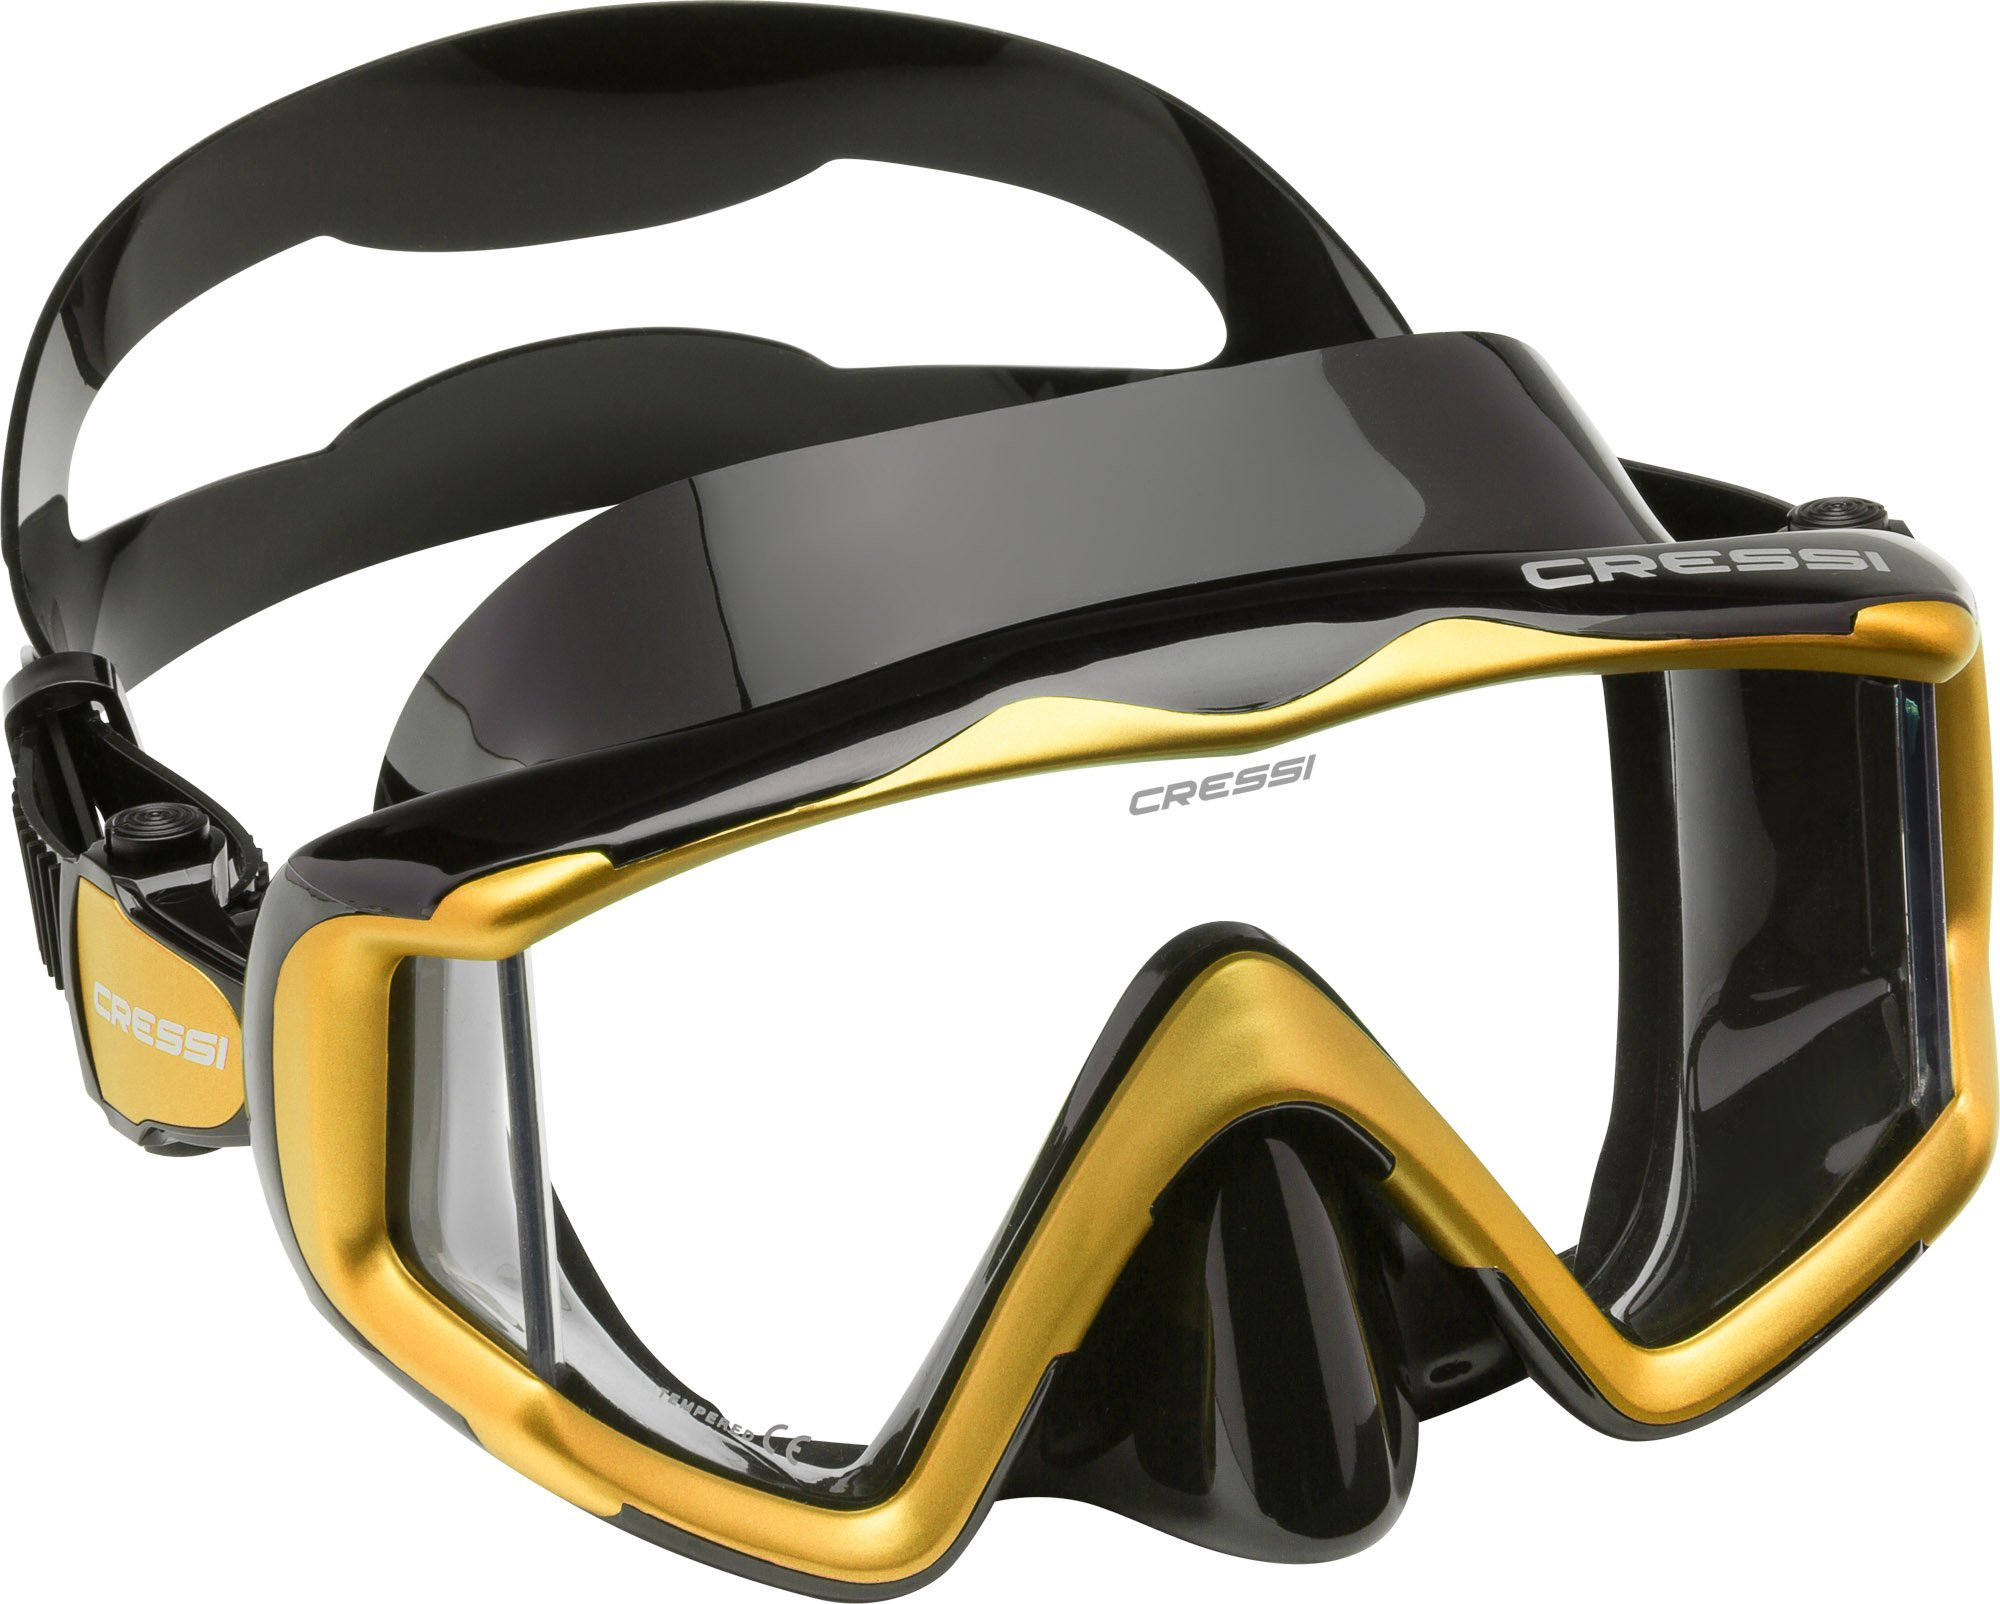 Cressi Liberty Triside Spe Diving Mask, Black/Black/Yellow